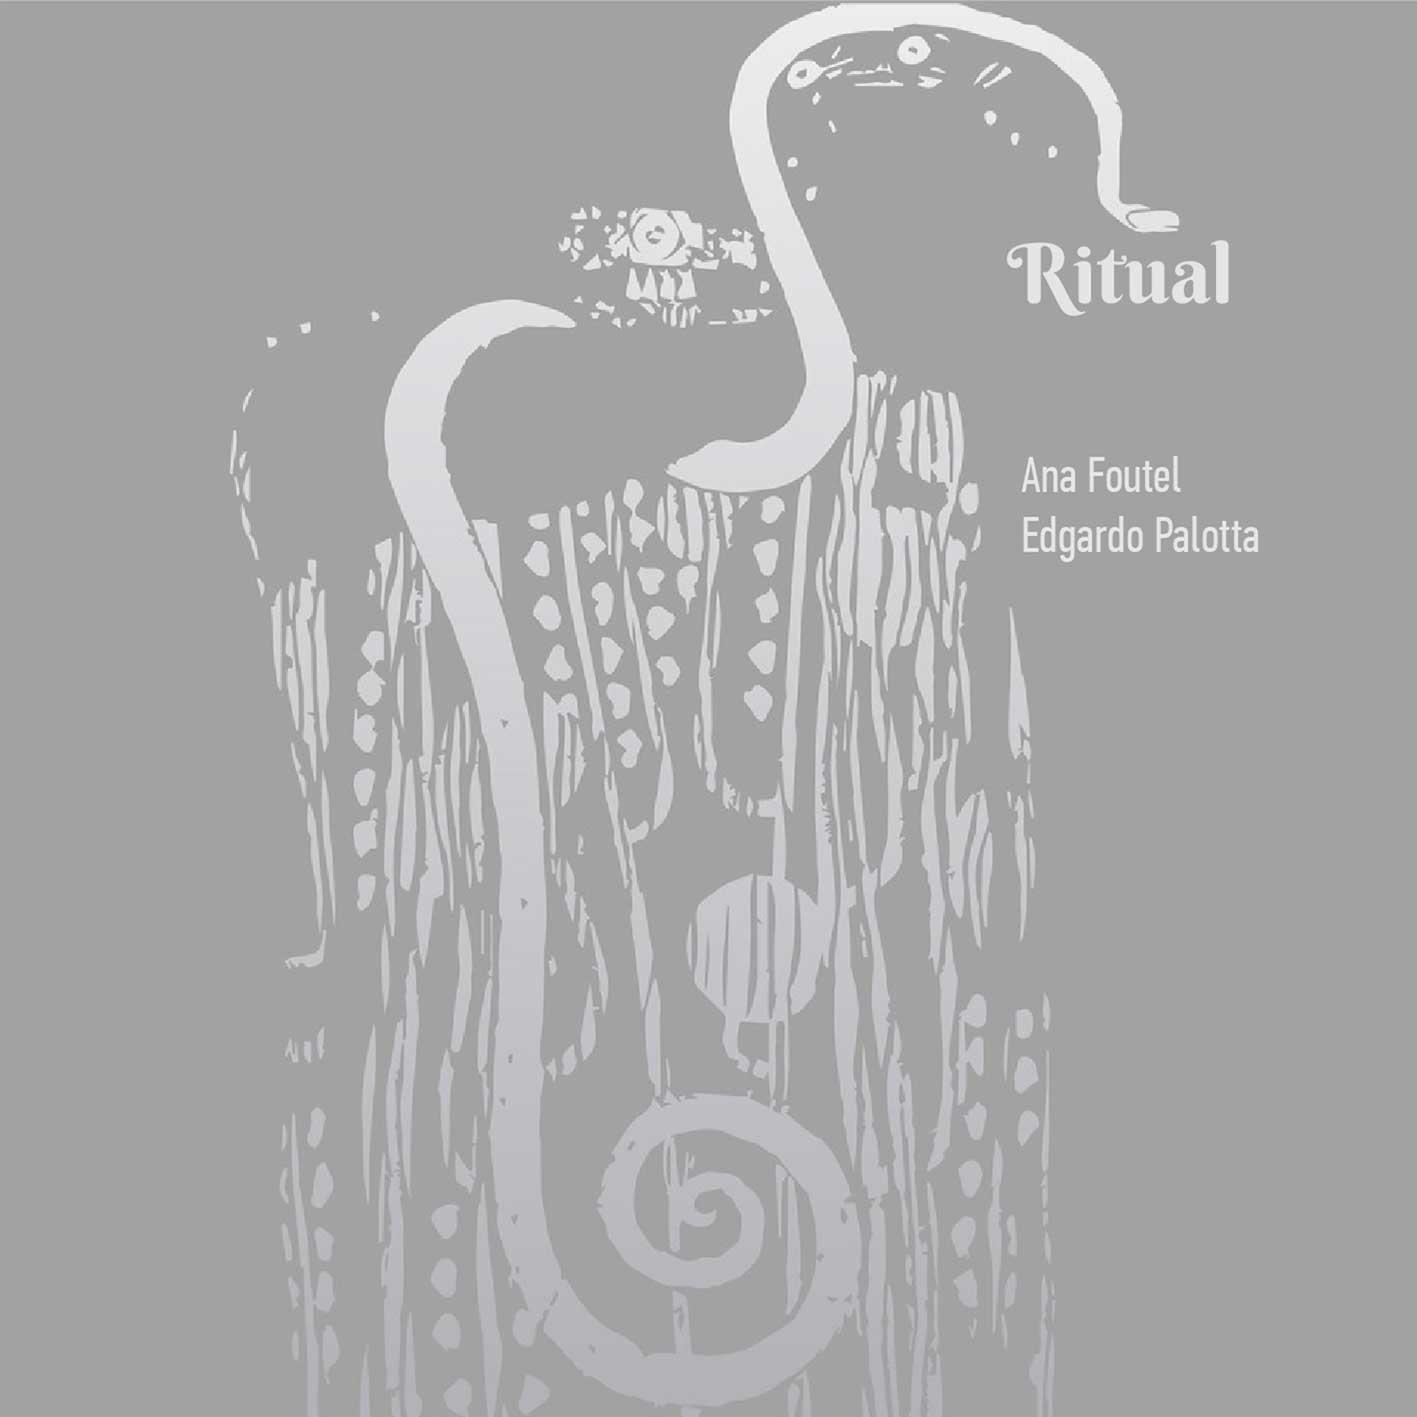 Ana Foutel / Edgardo Palotta – Ritual